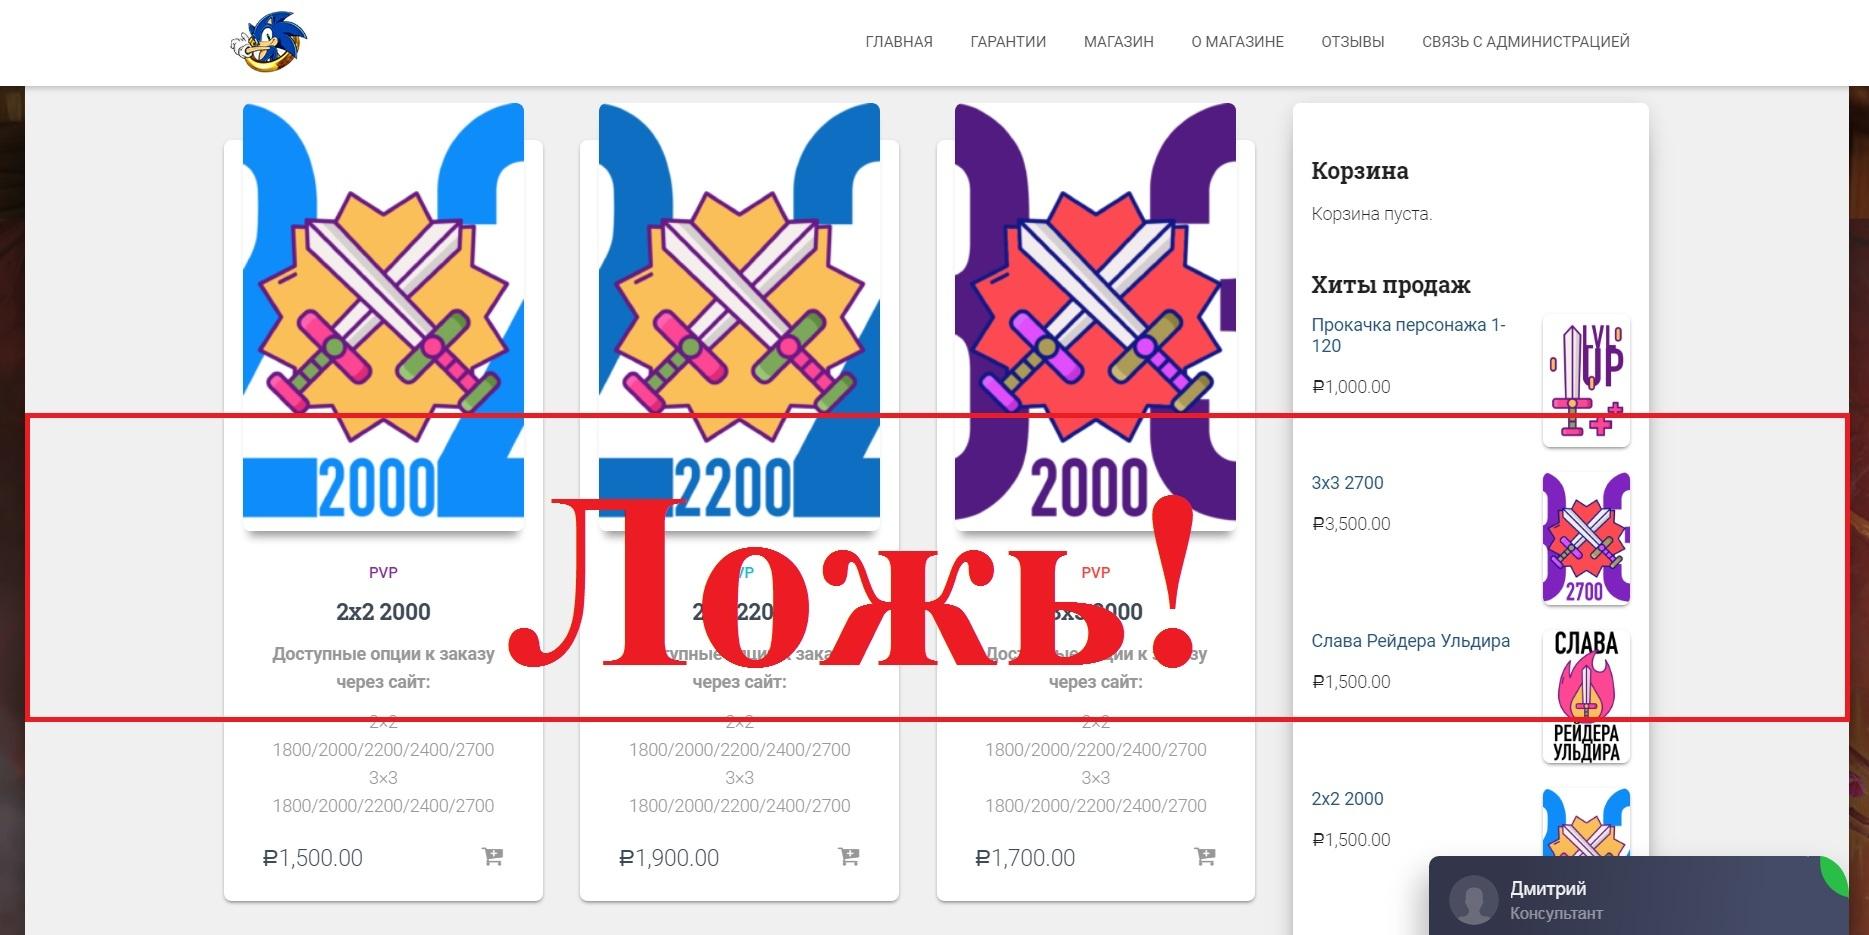 Sonicboost.ru – отзывы о магазине